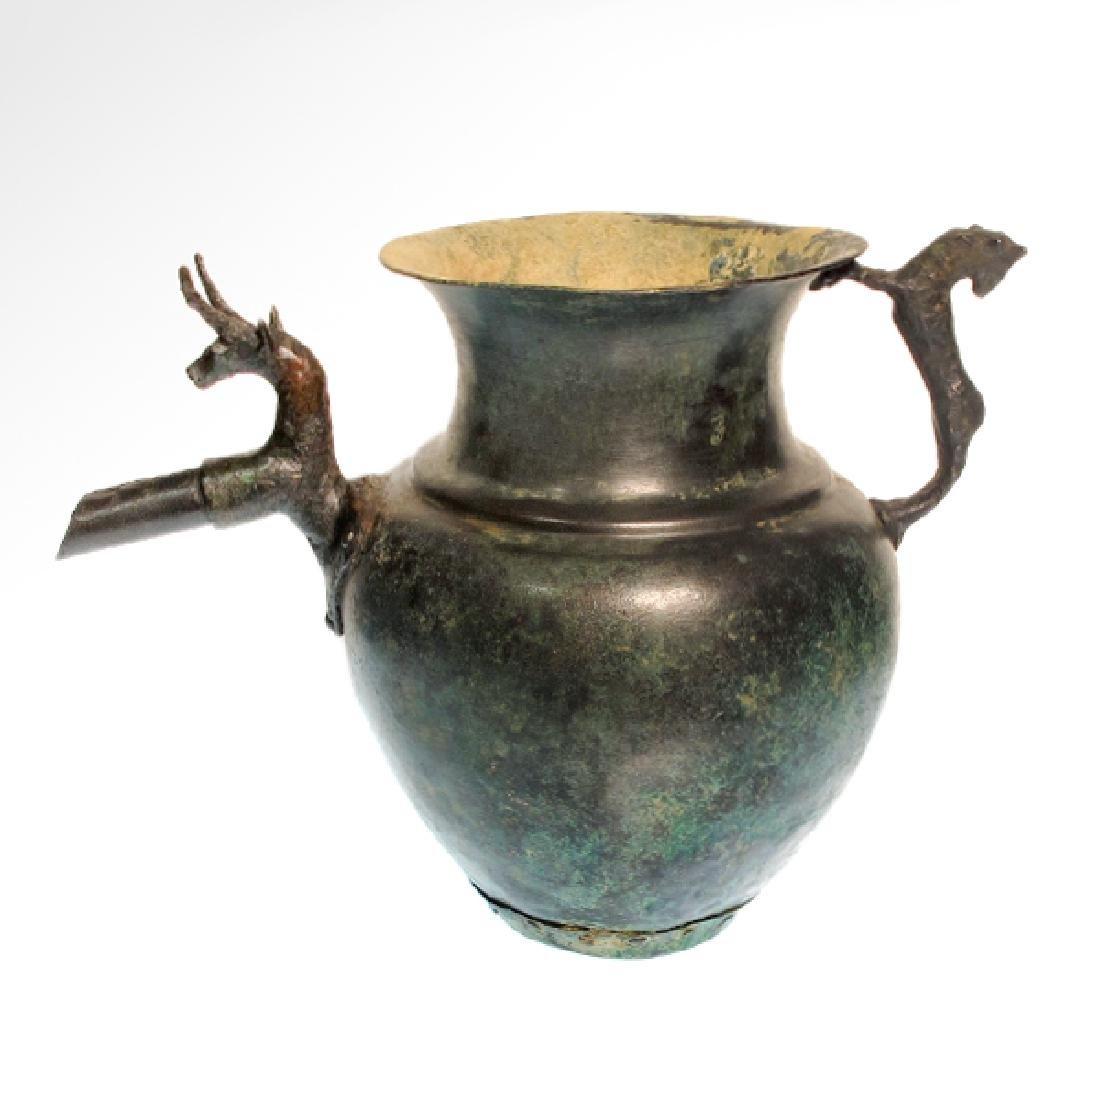 Luristan Bronze Jug with Stags, c. 900 B.C.